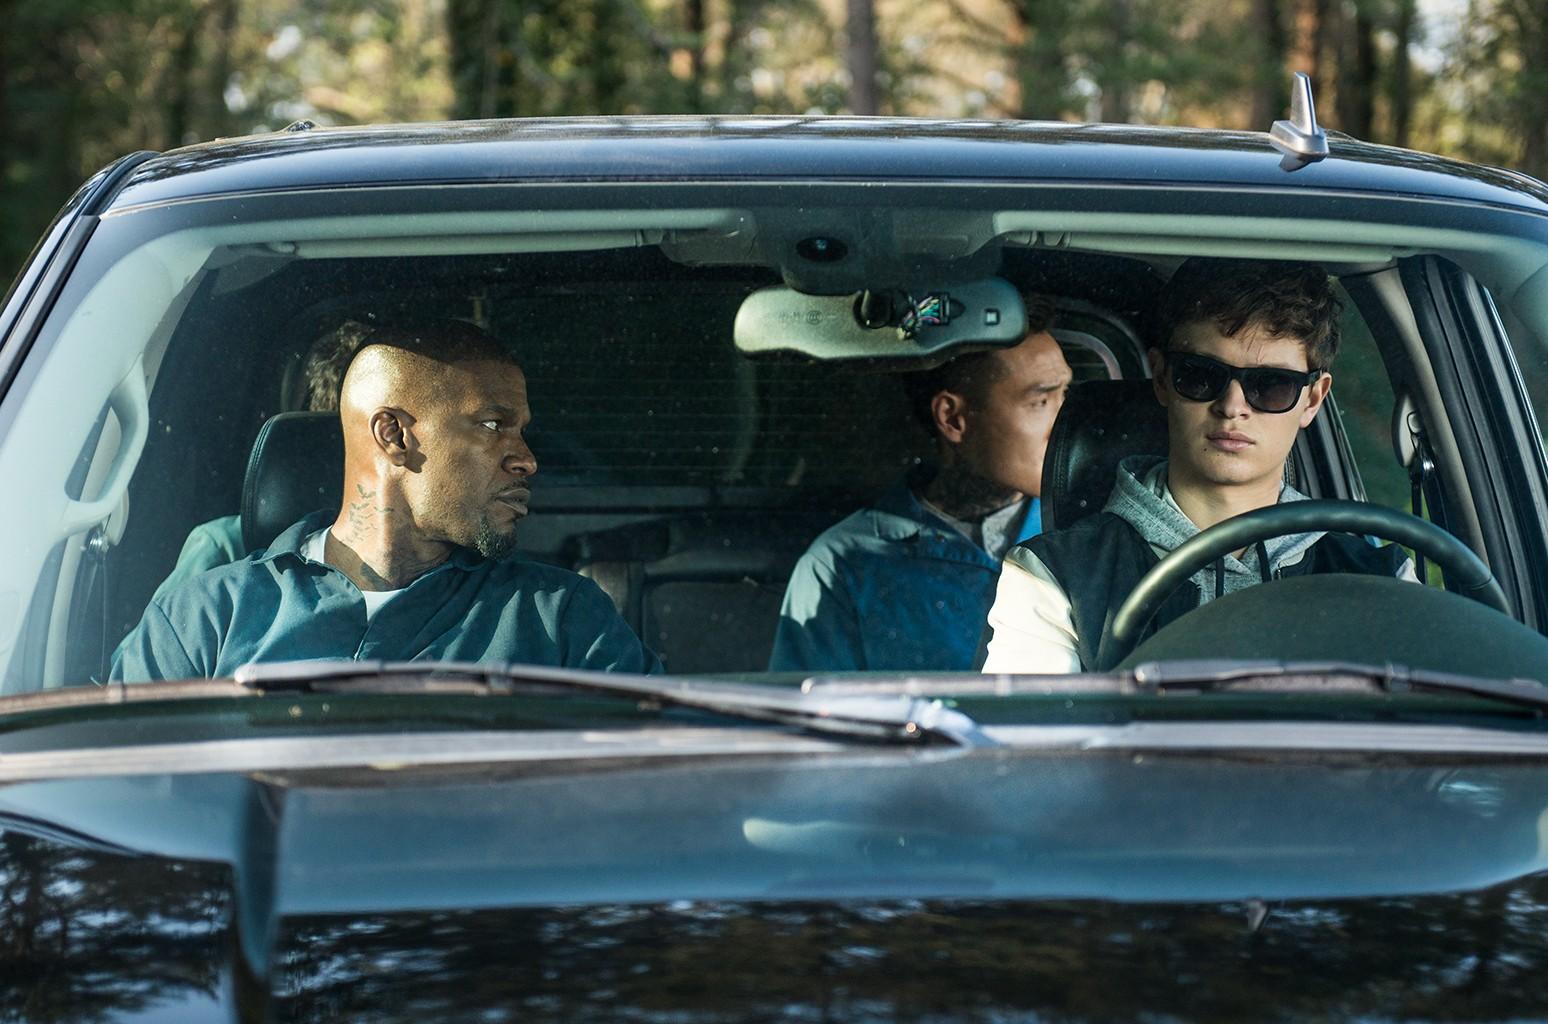 Ansel Elgort, Jamie Foxx, Flea Balzary and Lanny Joon in Baby Driver.